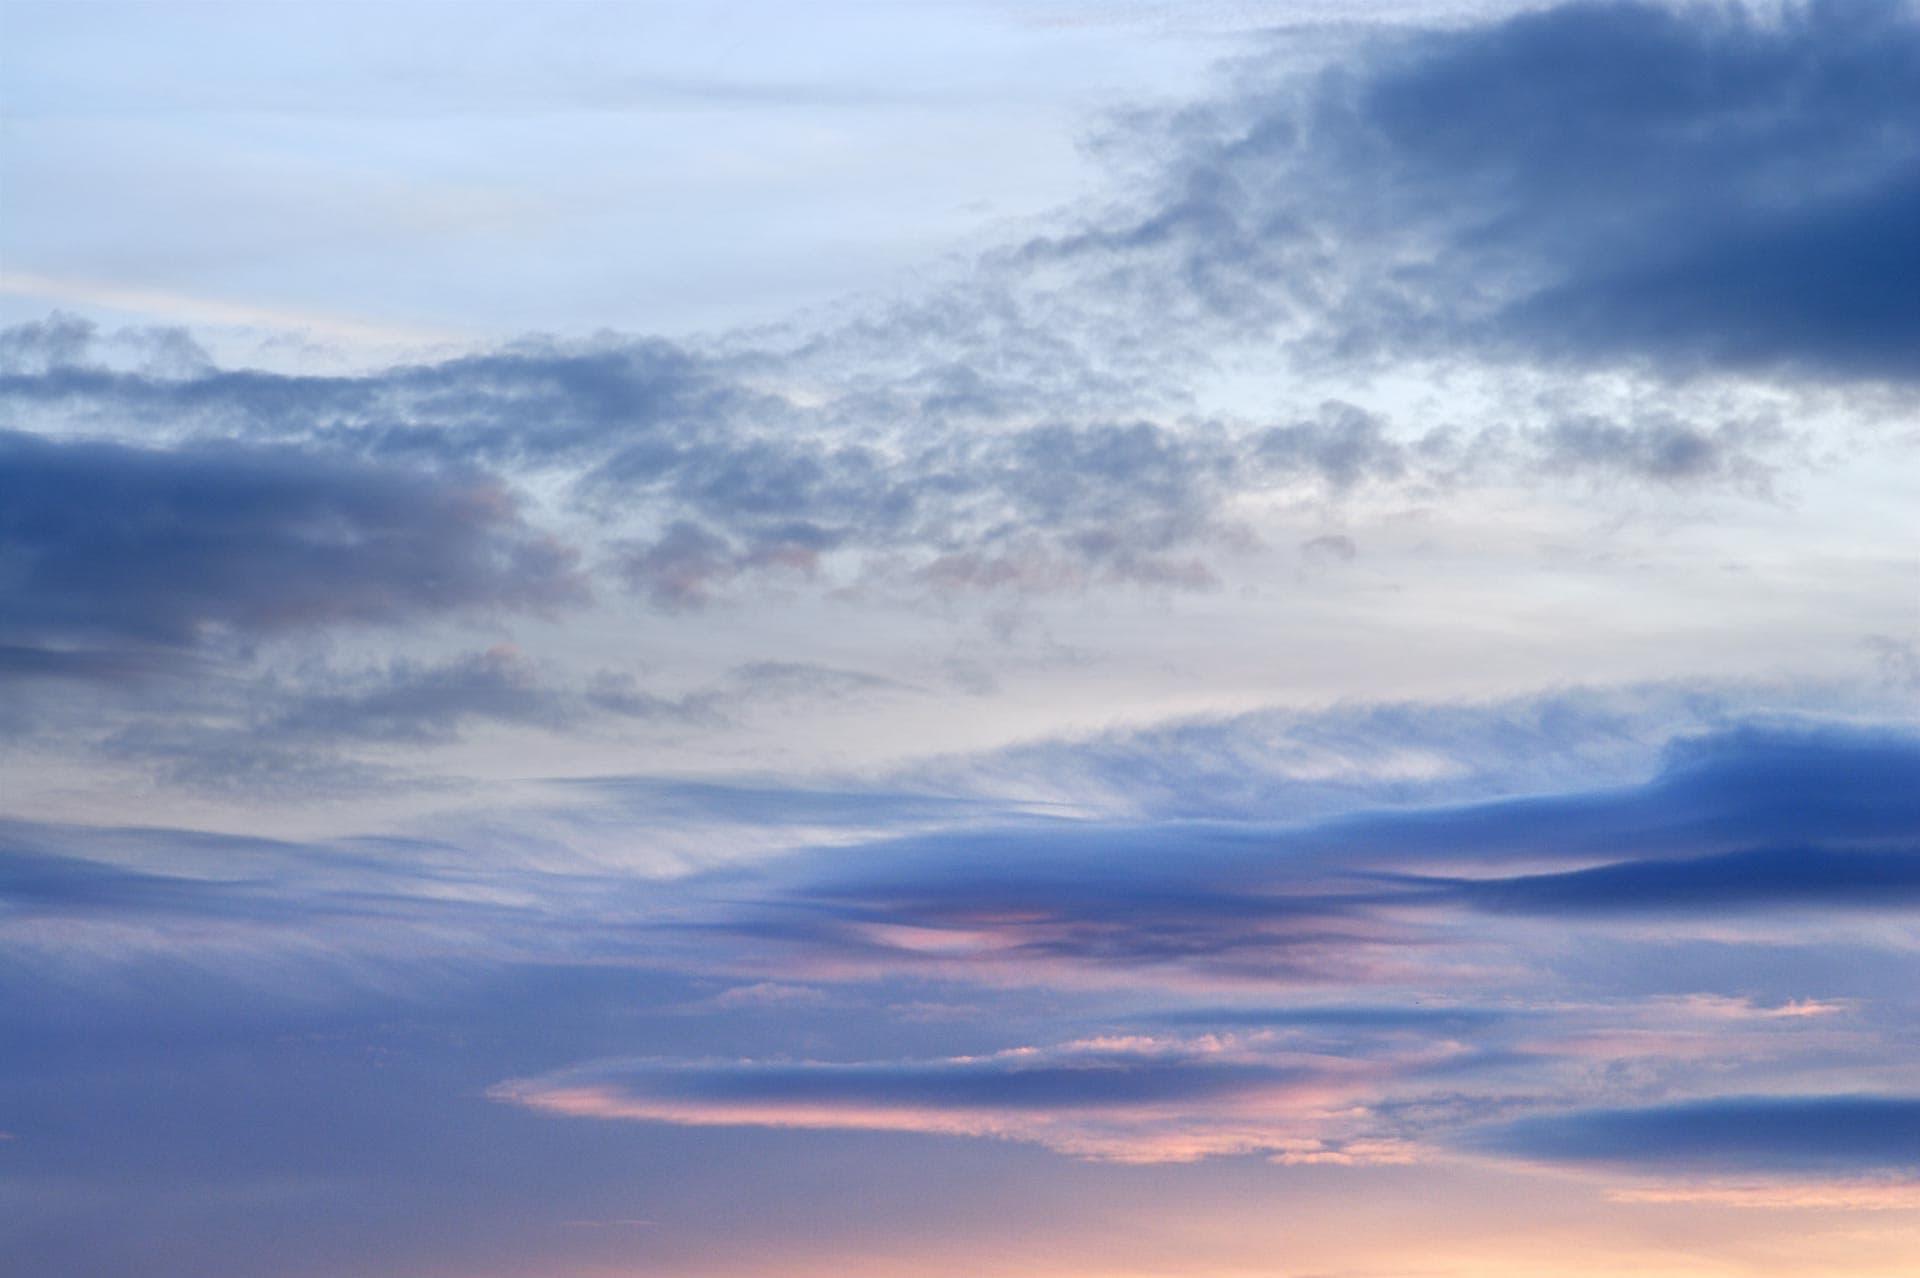 Evening skies over North Norfolk, near Sandringham, England, UK